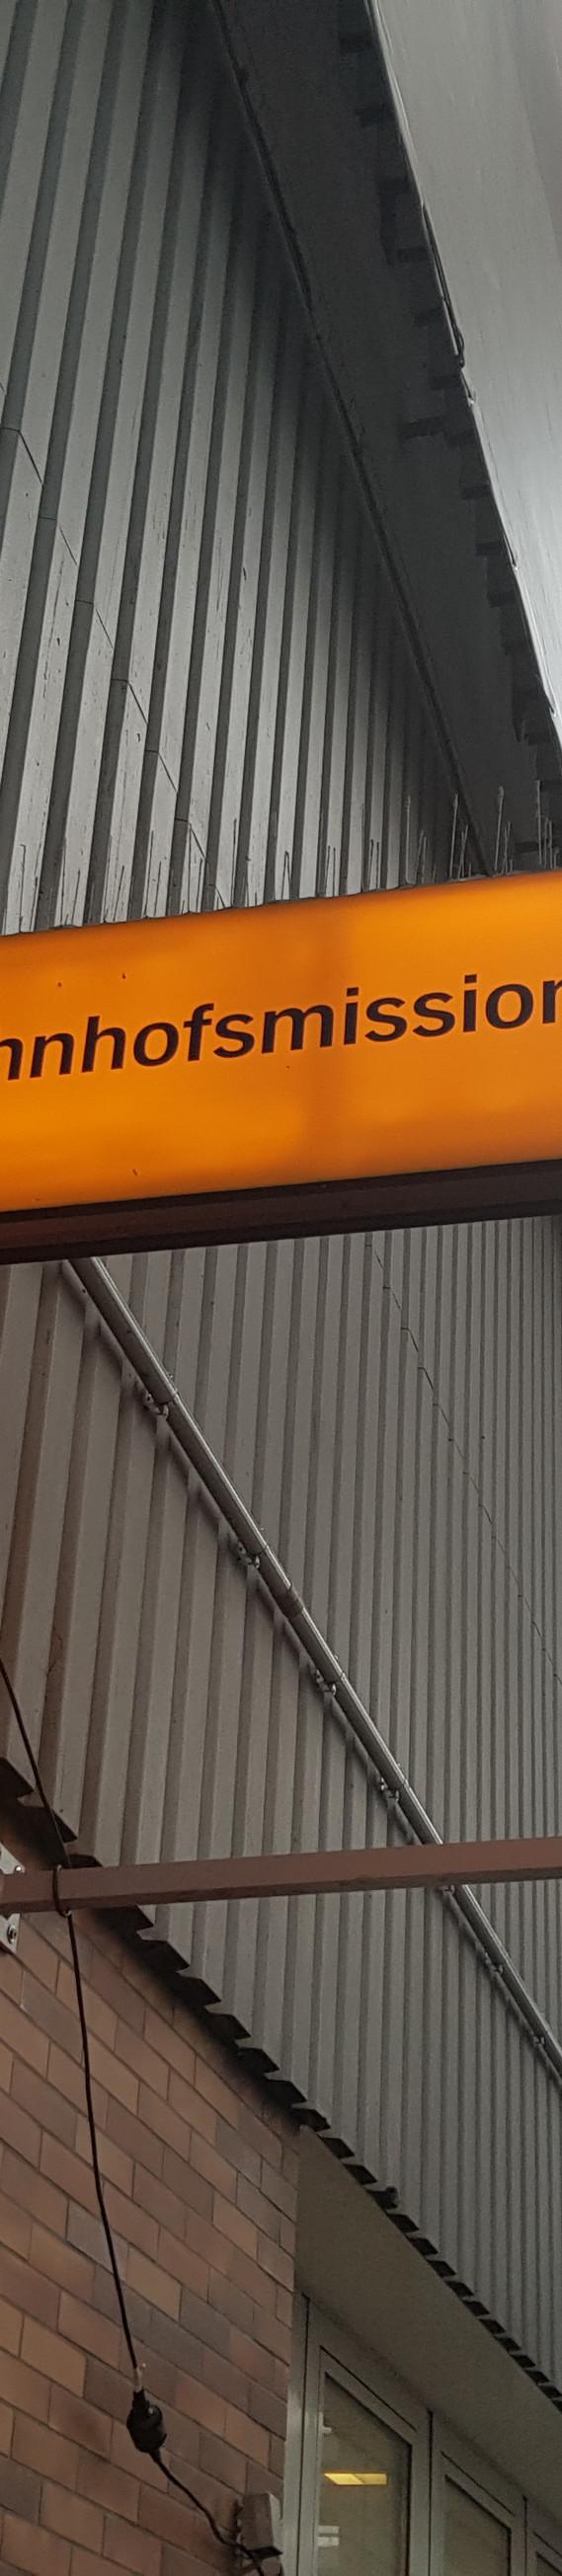 München Hbf - Bahnhofsmission